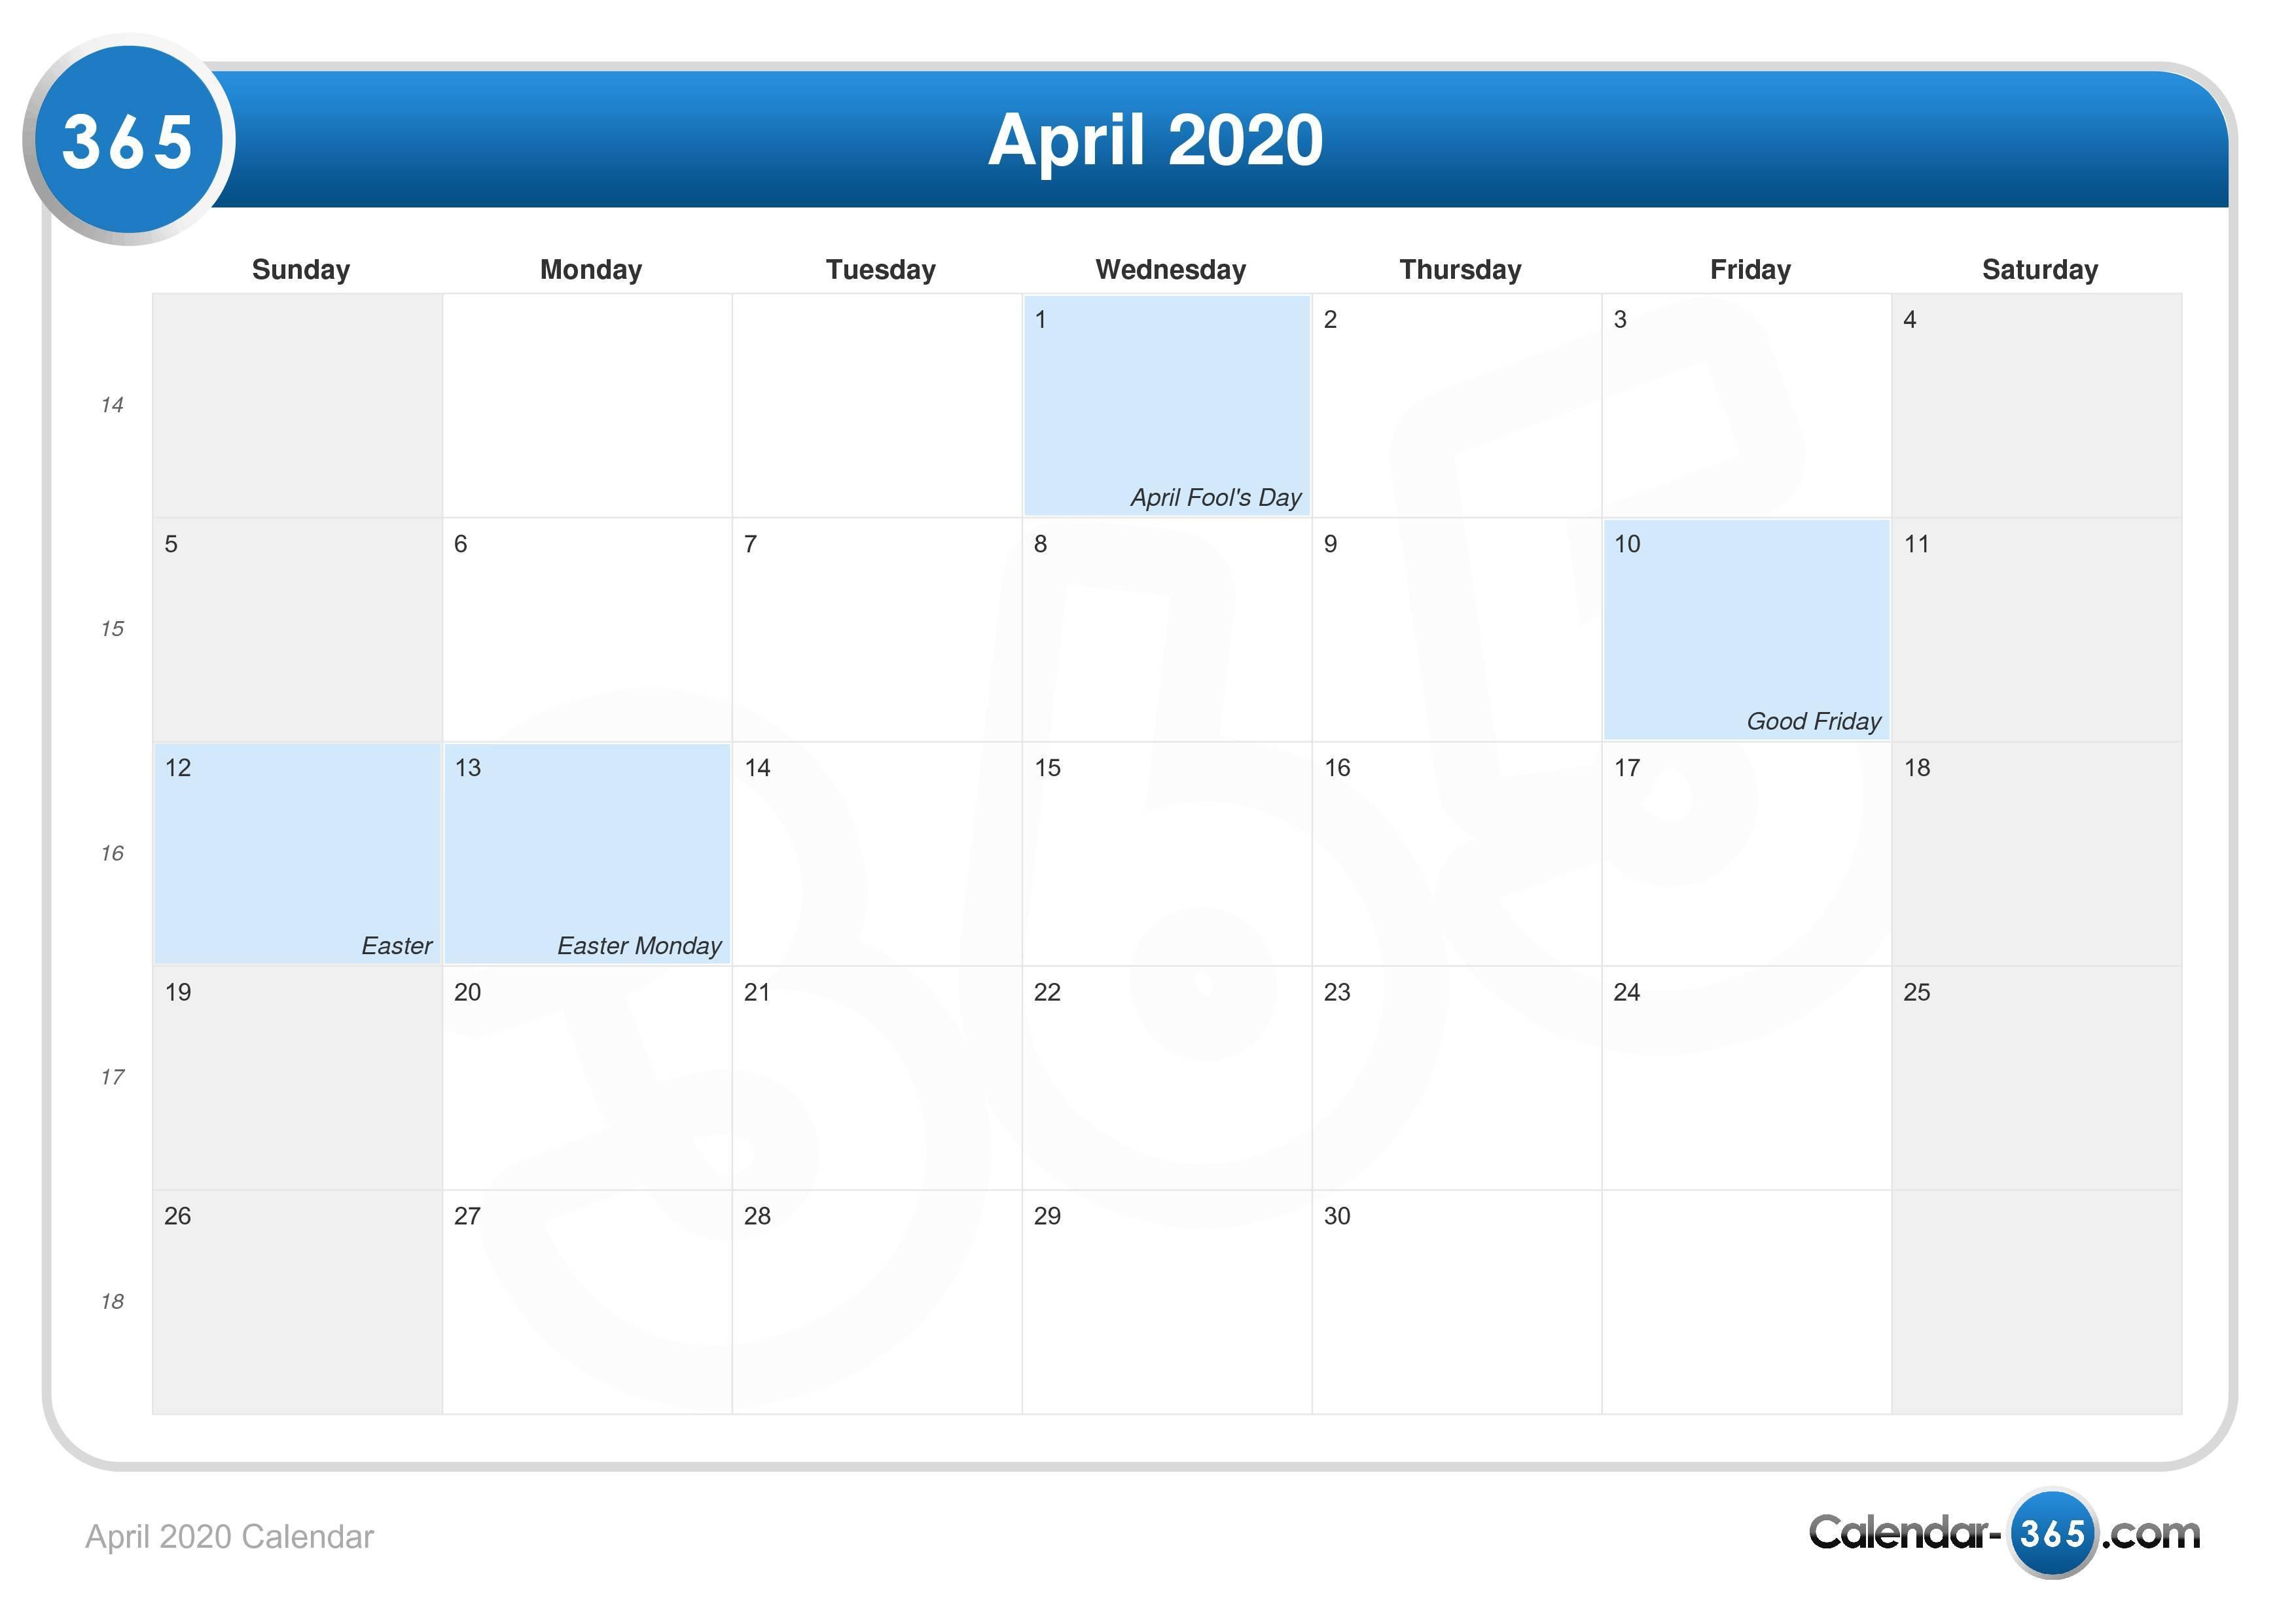 2020 Calendar Holidays Easter